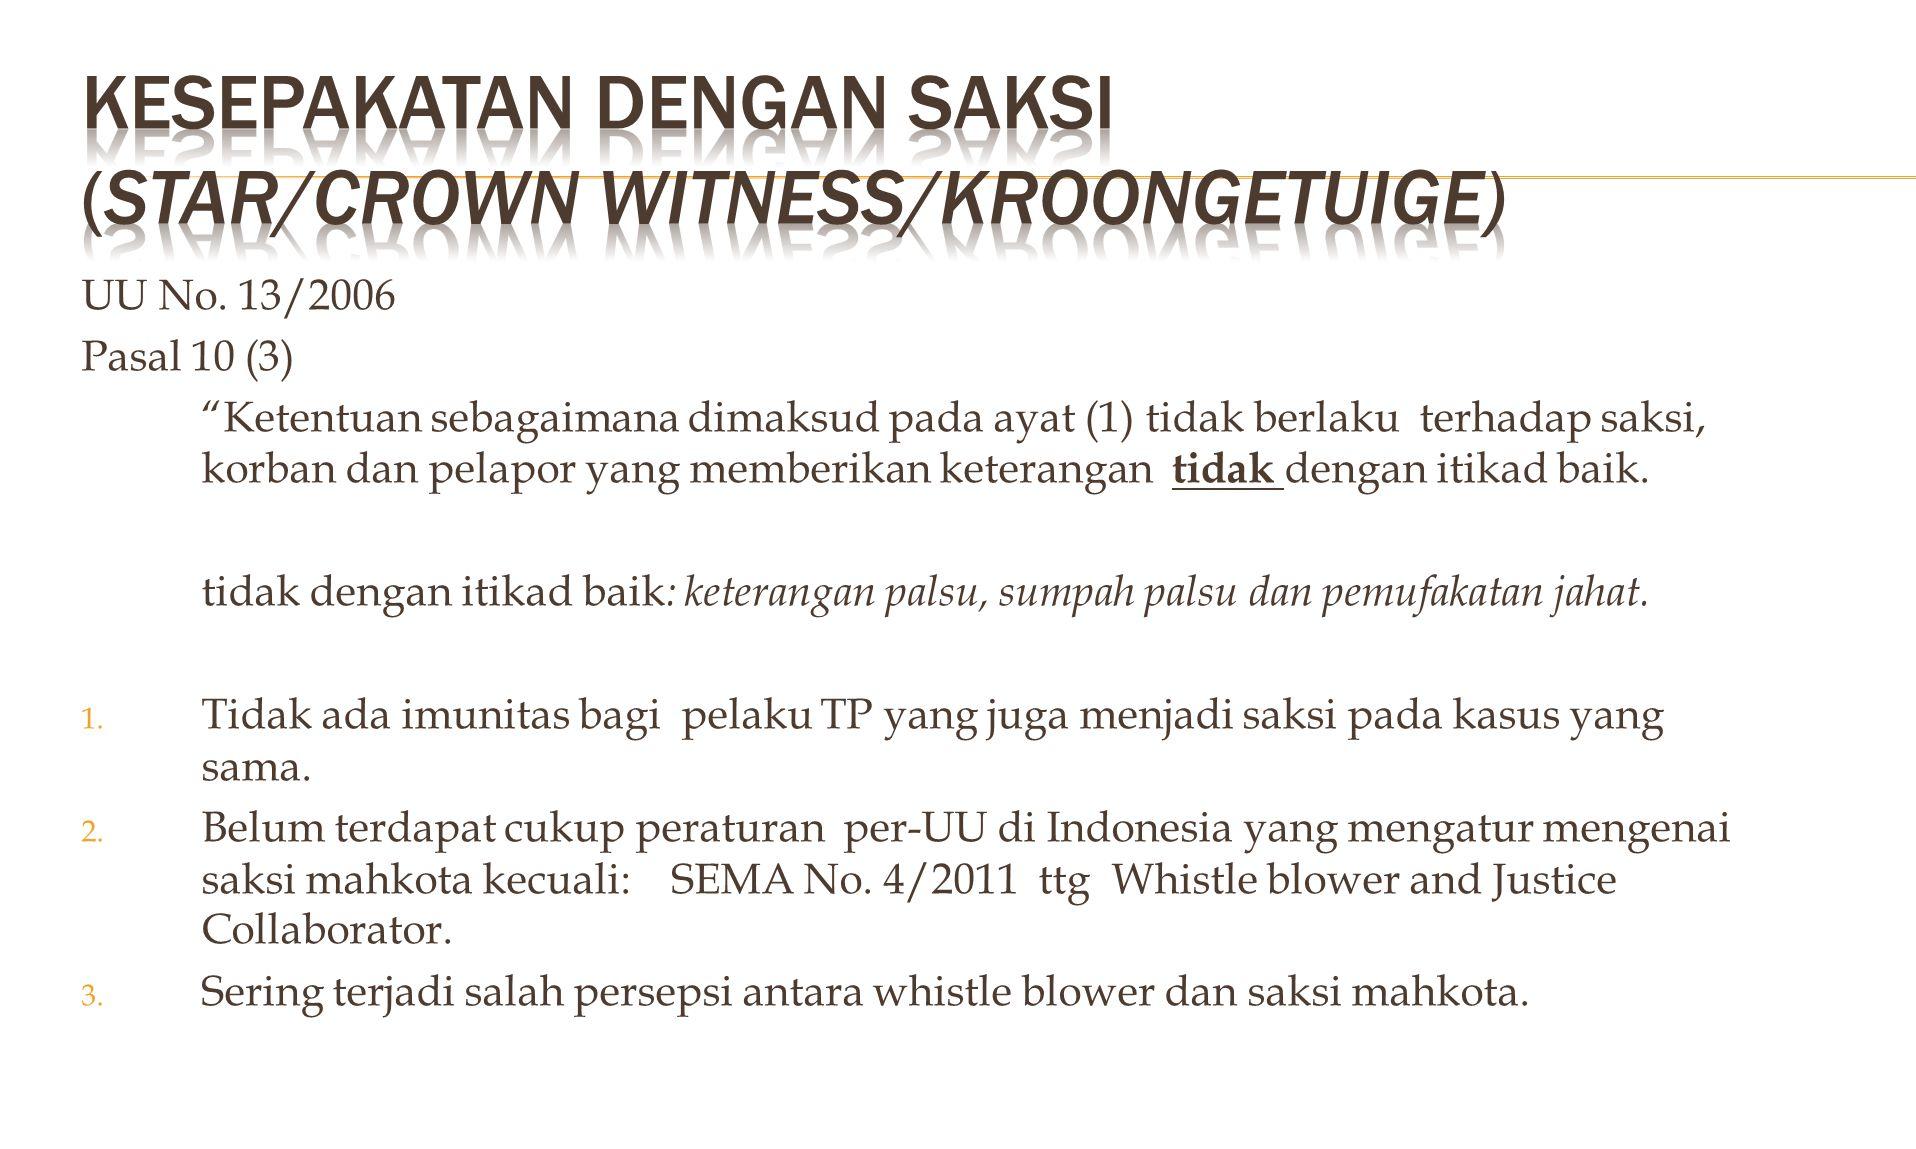 KESEPAKATAN DENGAN SAKSI (star/crown witness/kroongetuige)